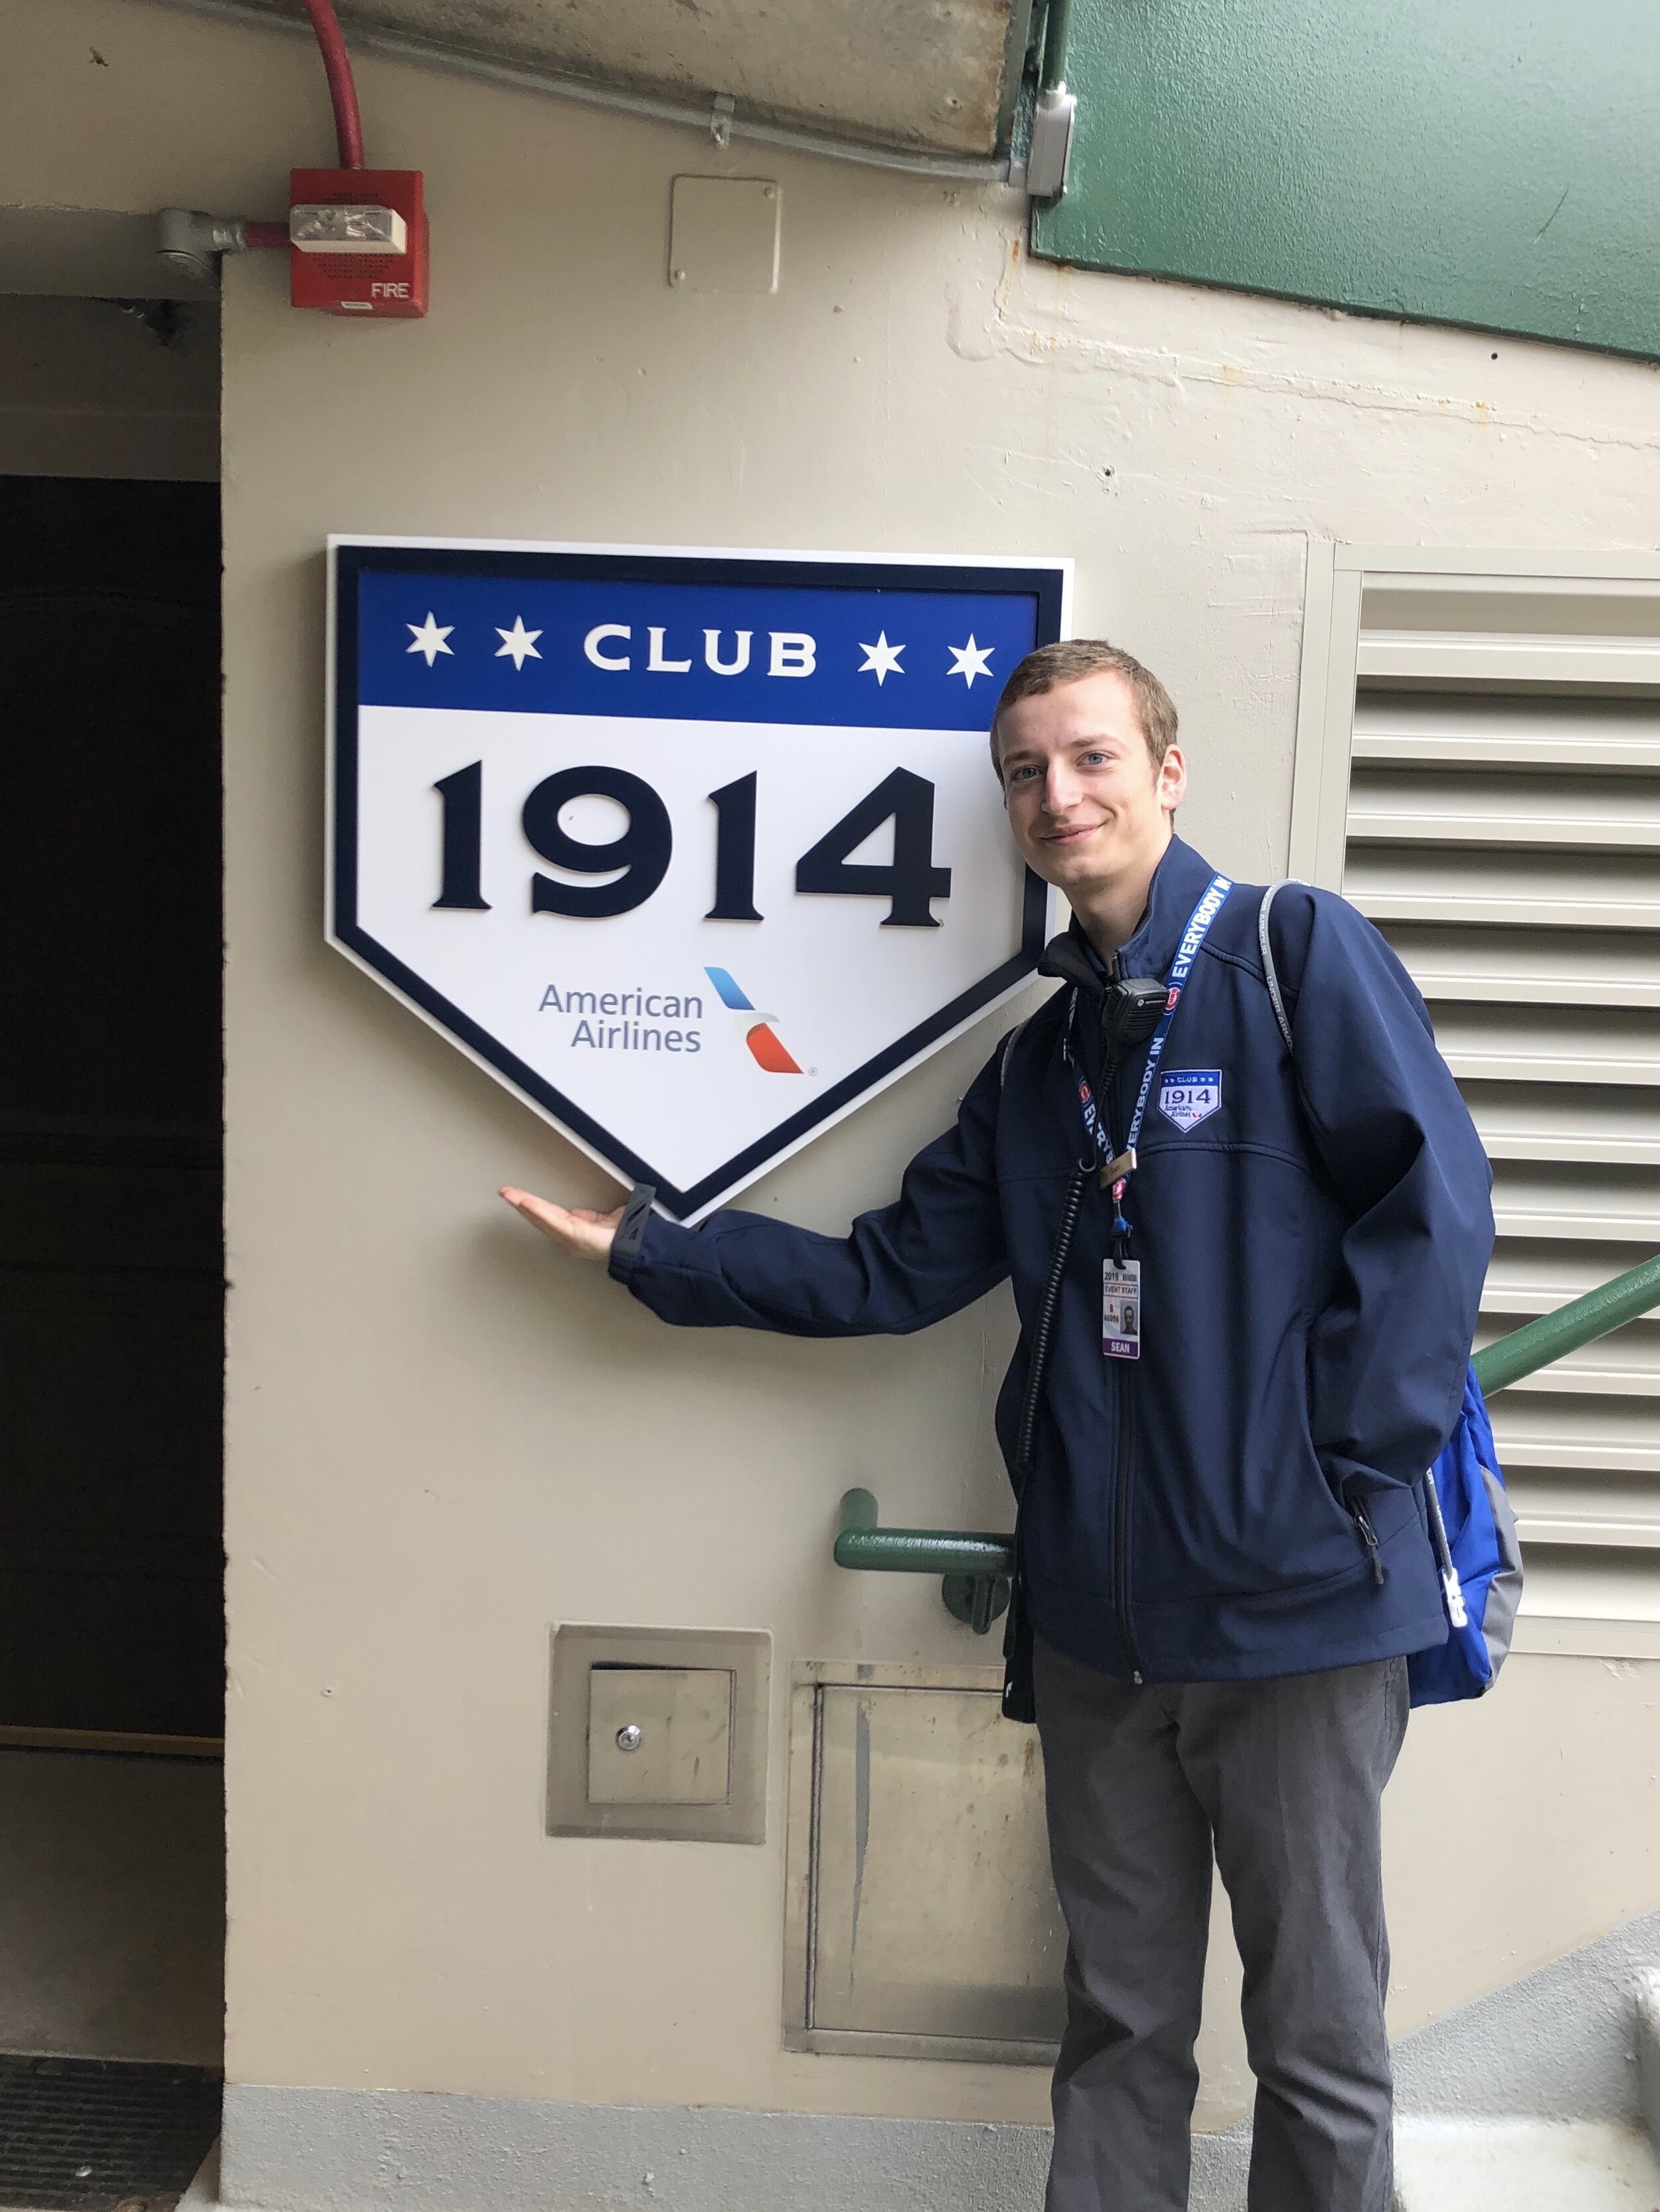 Sean working at Club 1914 at Wrigley Field